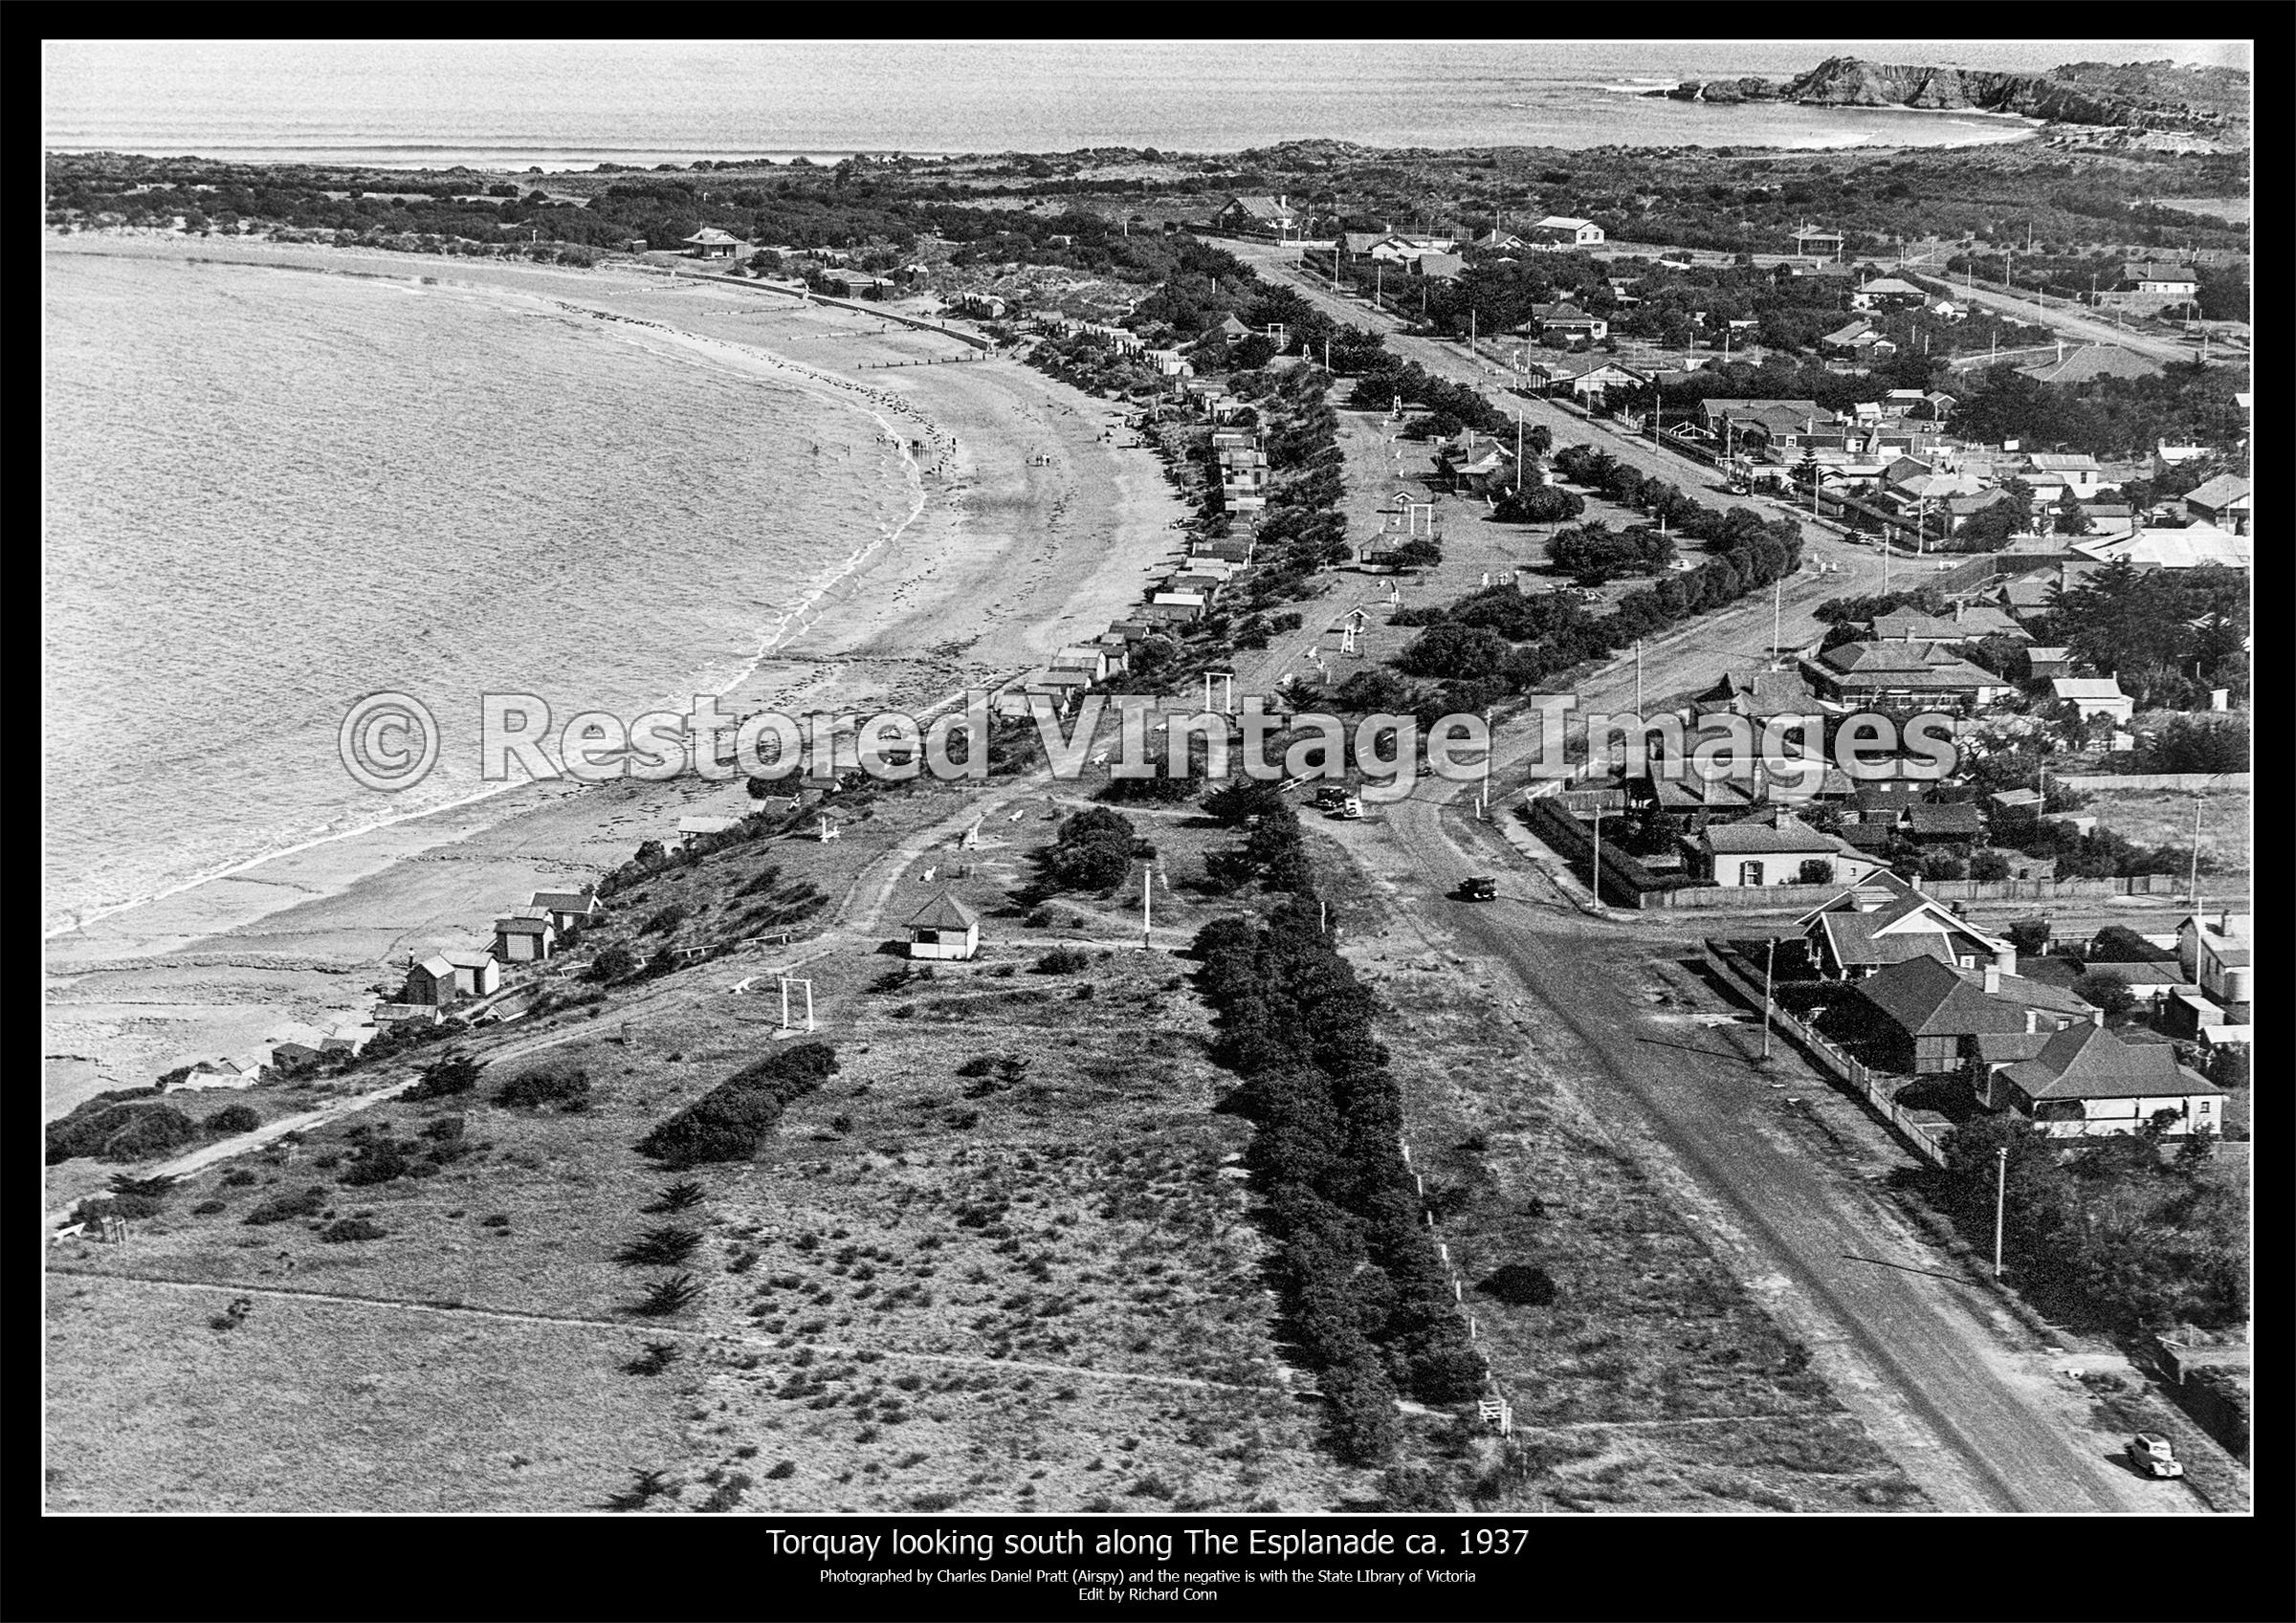 Torquay Aerial Looking South Along The Esplanade Ca. 1937